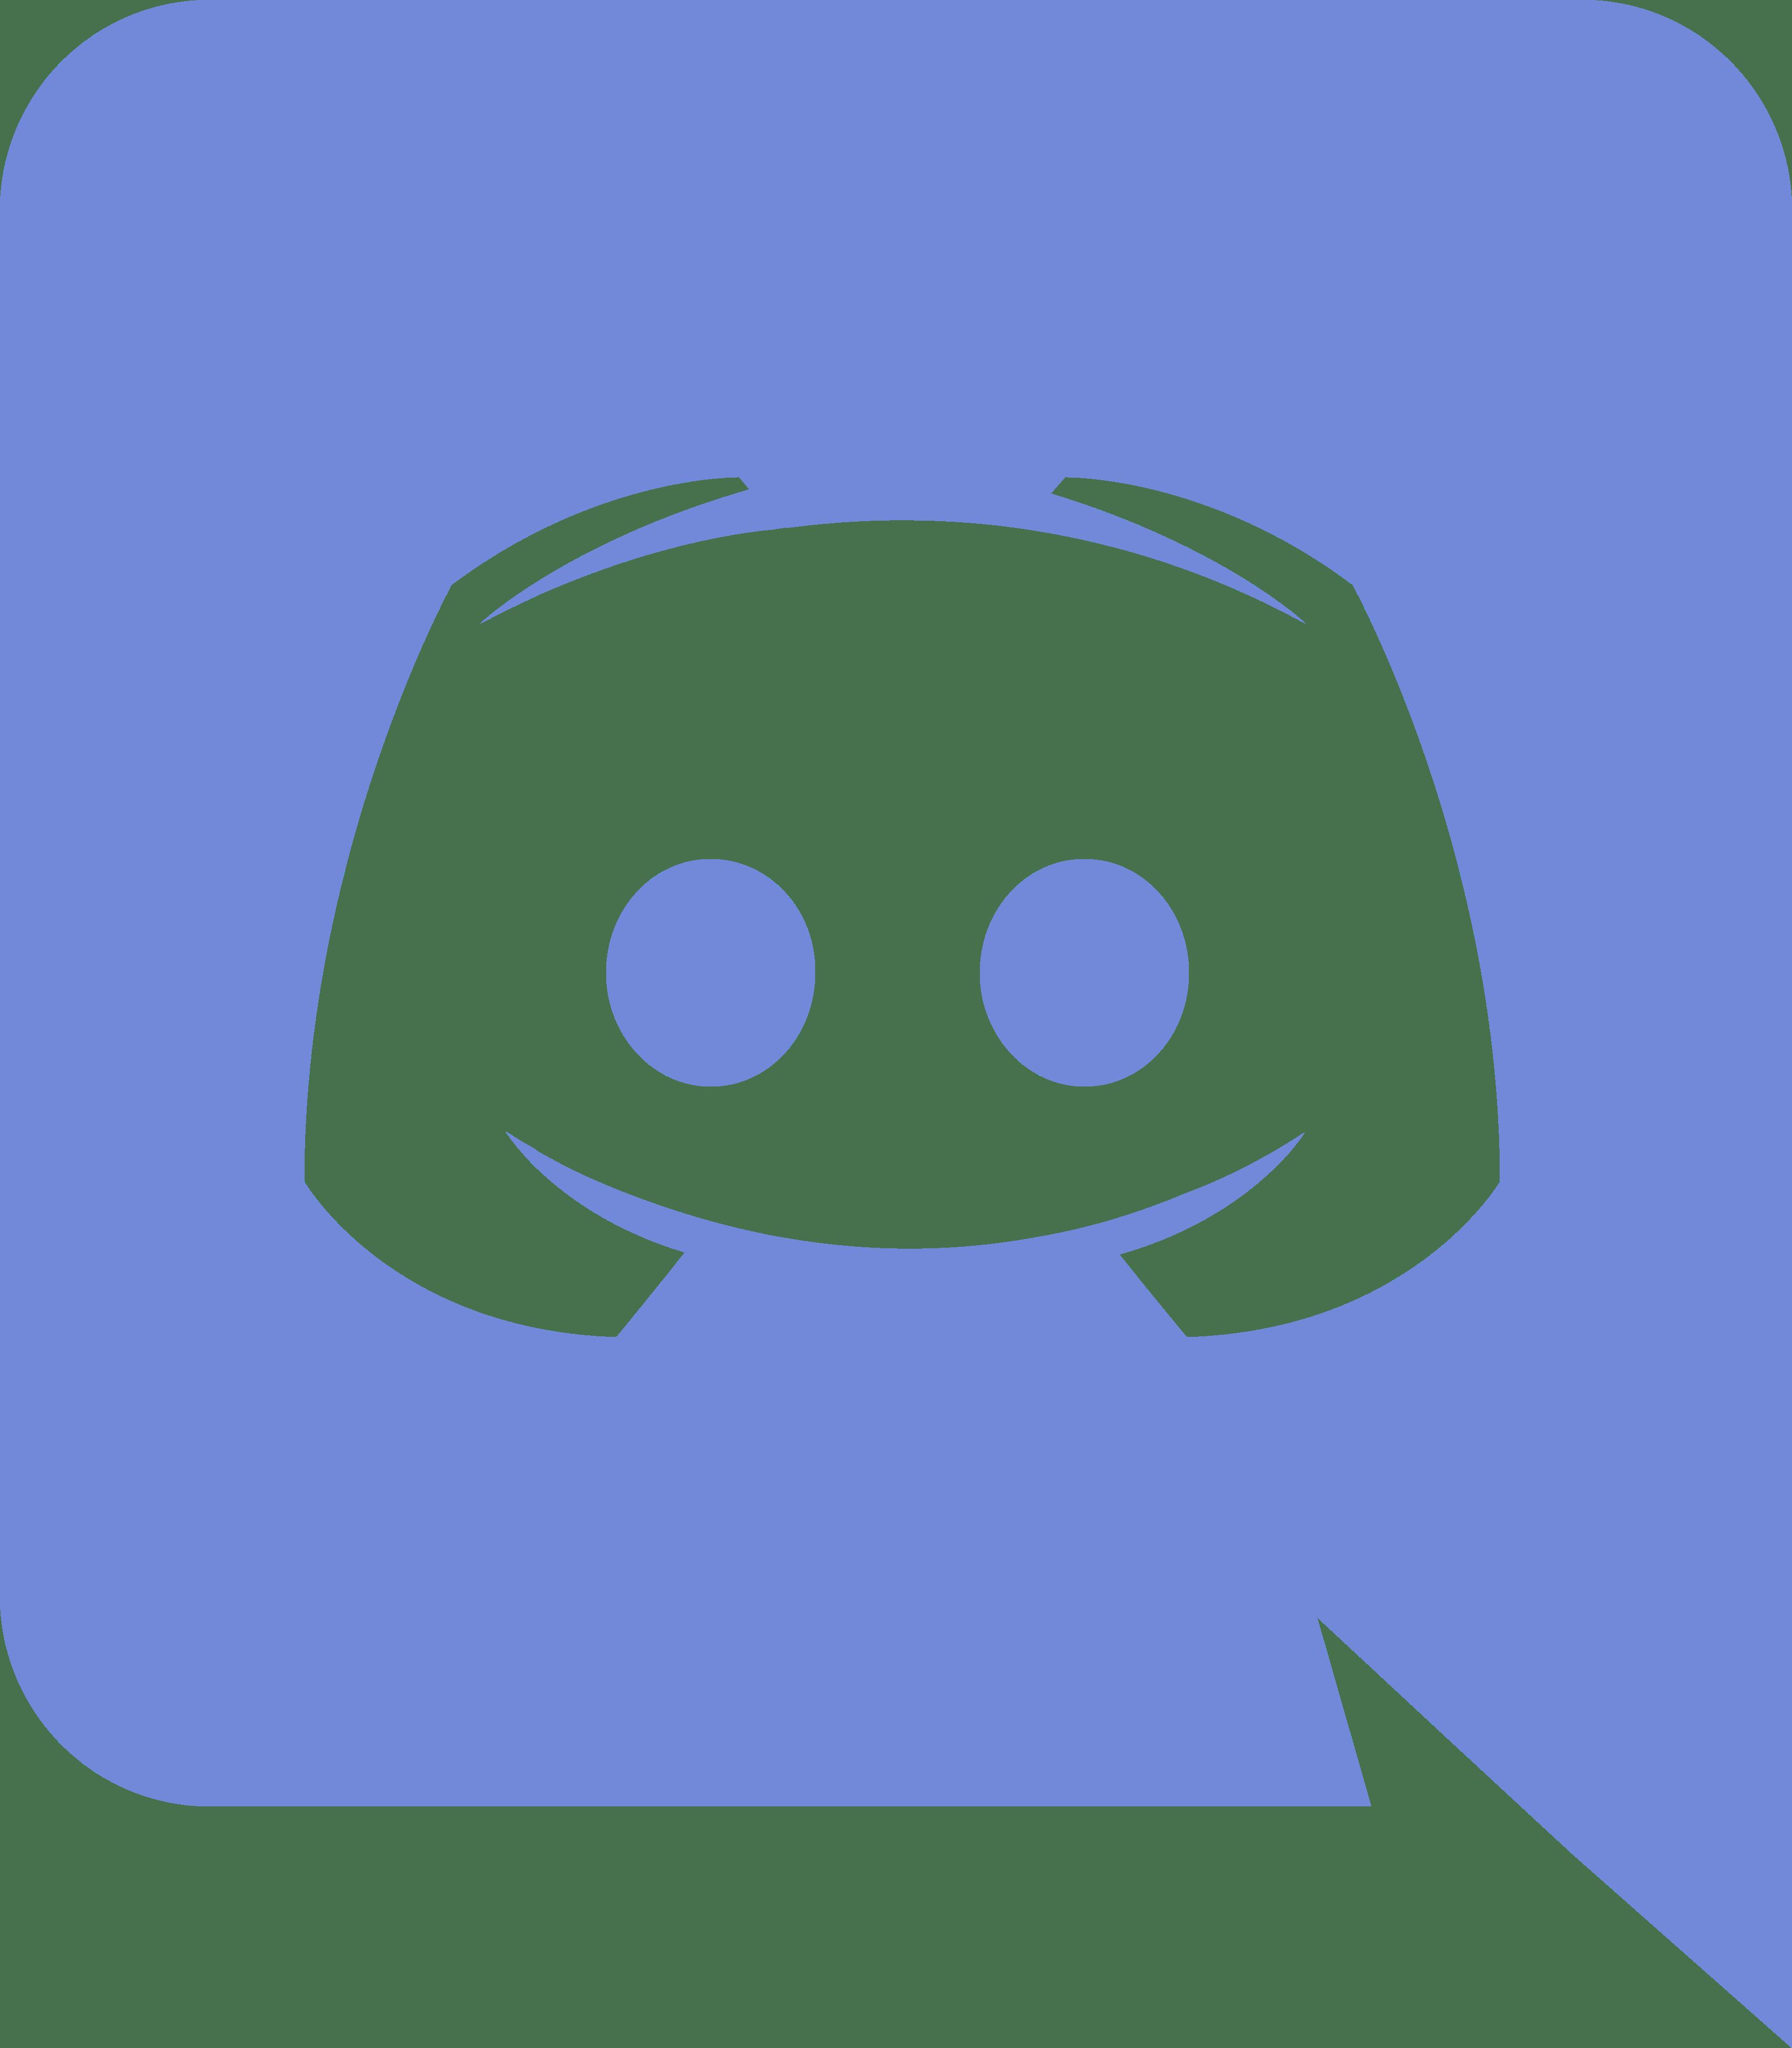 DiscordApp